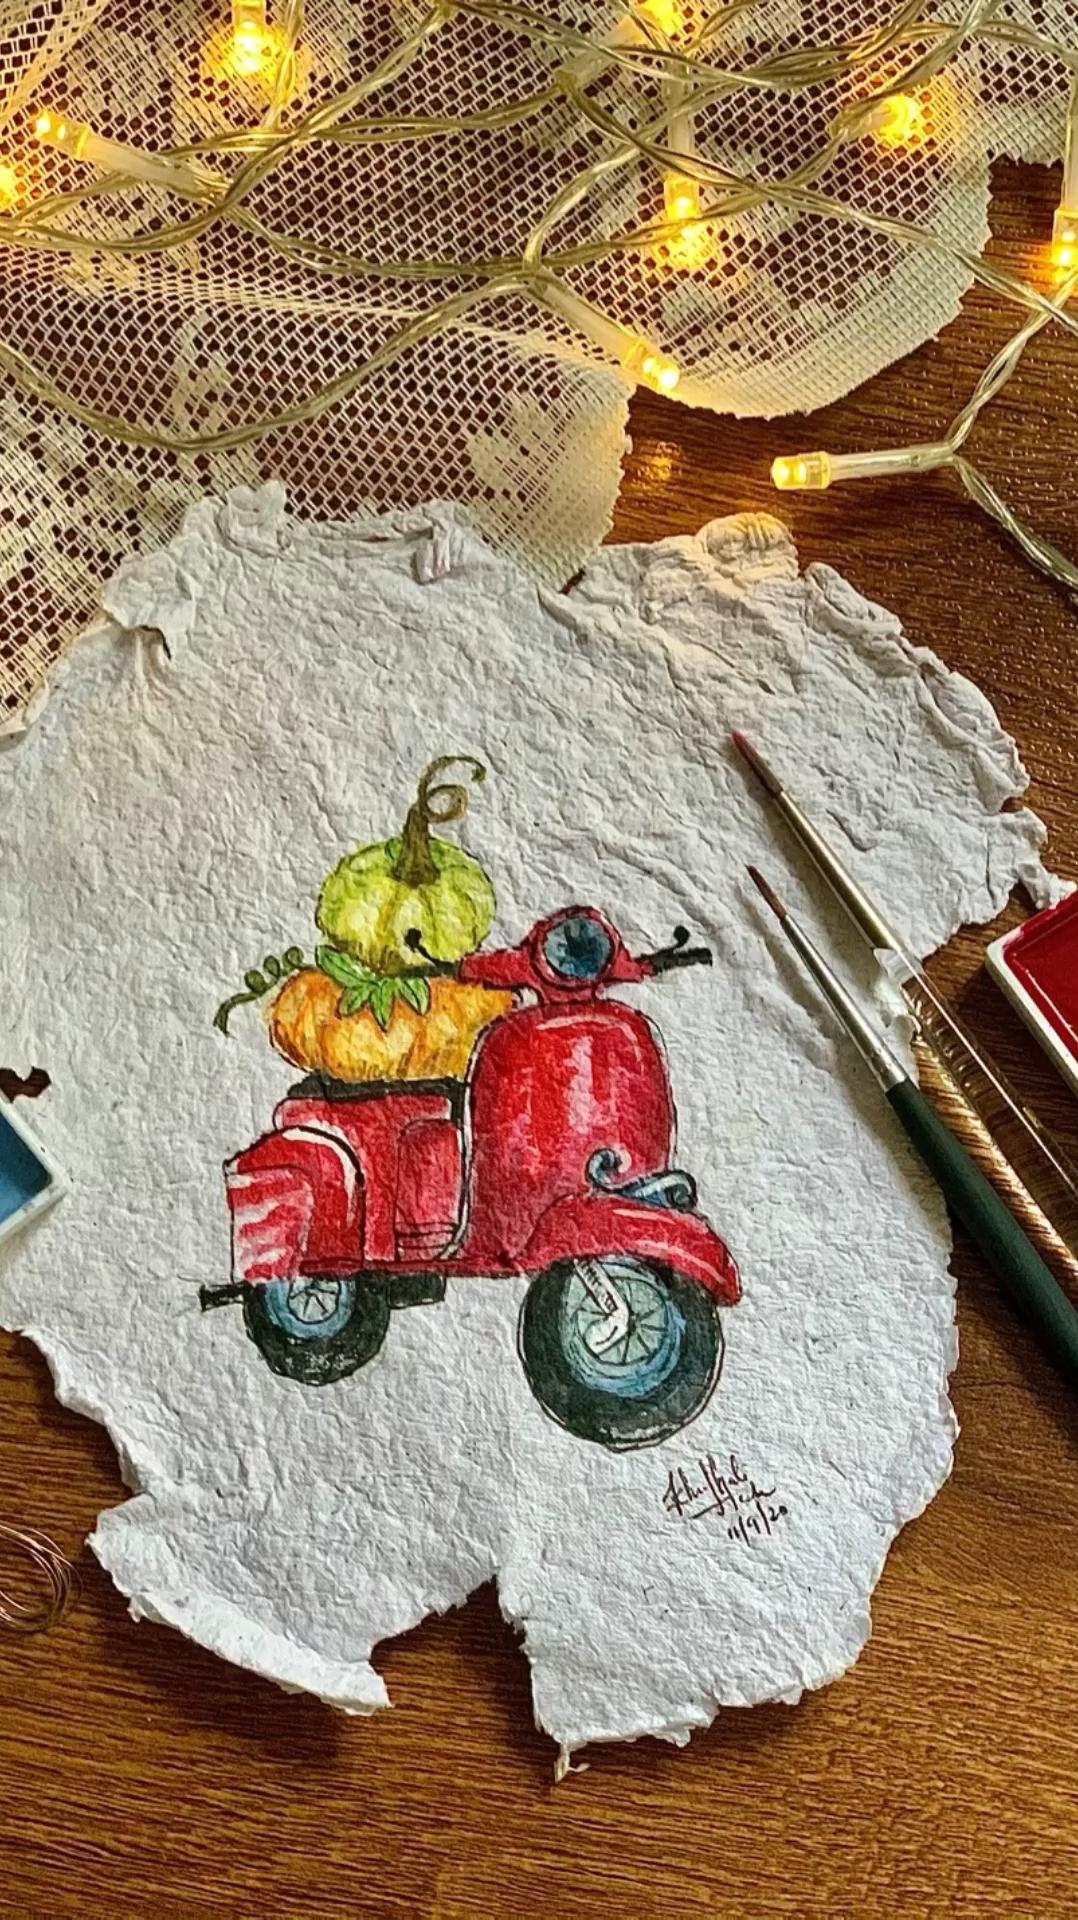 ##lwinsorandnewton #kuretakegansaitambi #watercolor_guide #pumpkinseason #fallpainting #autumnpainting #autumnseason #fall2020 #coloursoffall #watercolorartwork #kreatio #vespaart #handmadepaper #paintingpumpkins #fallart #cutedrawings #handmadepainting #watercolorist #watercolourillustration #vintagepainting #vintageart #watercolorbotanical #itsybitsydtcall #illustration_art #illustratedart #loosewatercolor #watercolorpaintings #watercolorartist #watercolorpaint #gansaitambi